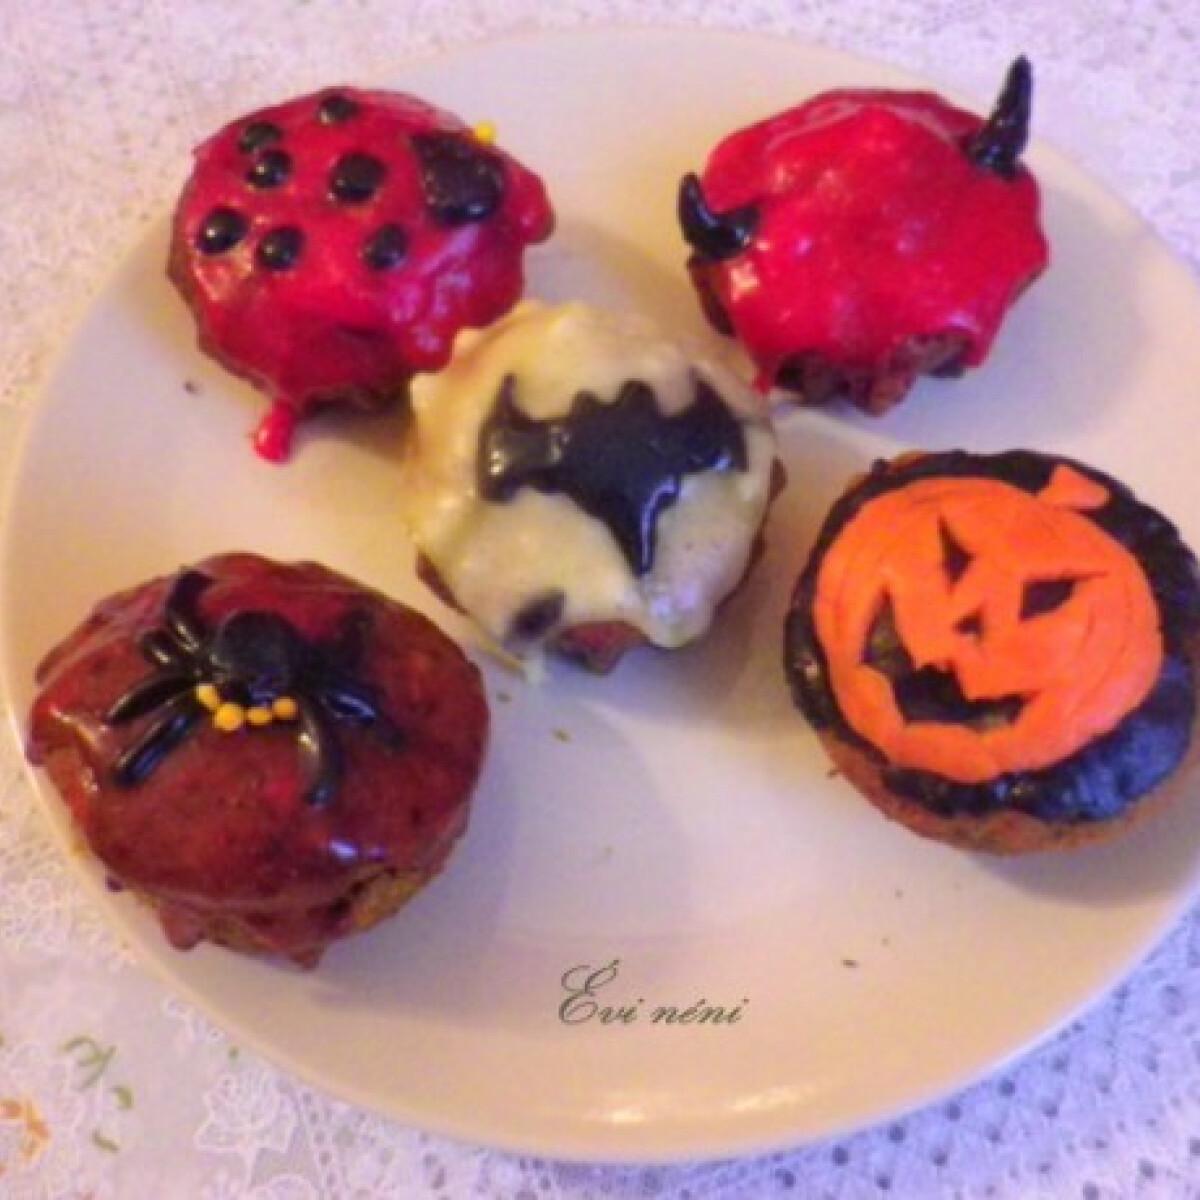 Halloweeni muffinok Évi nénitől